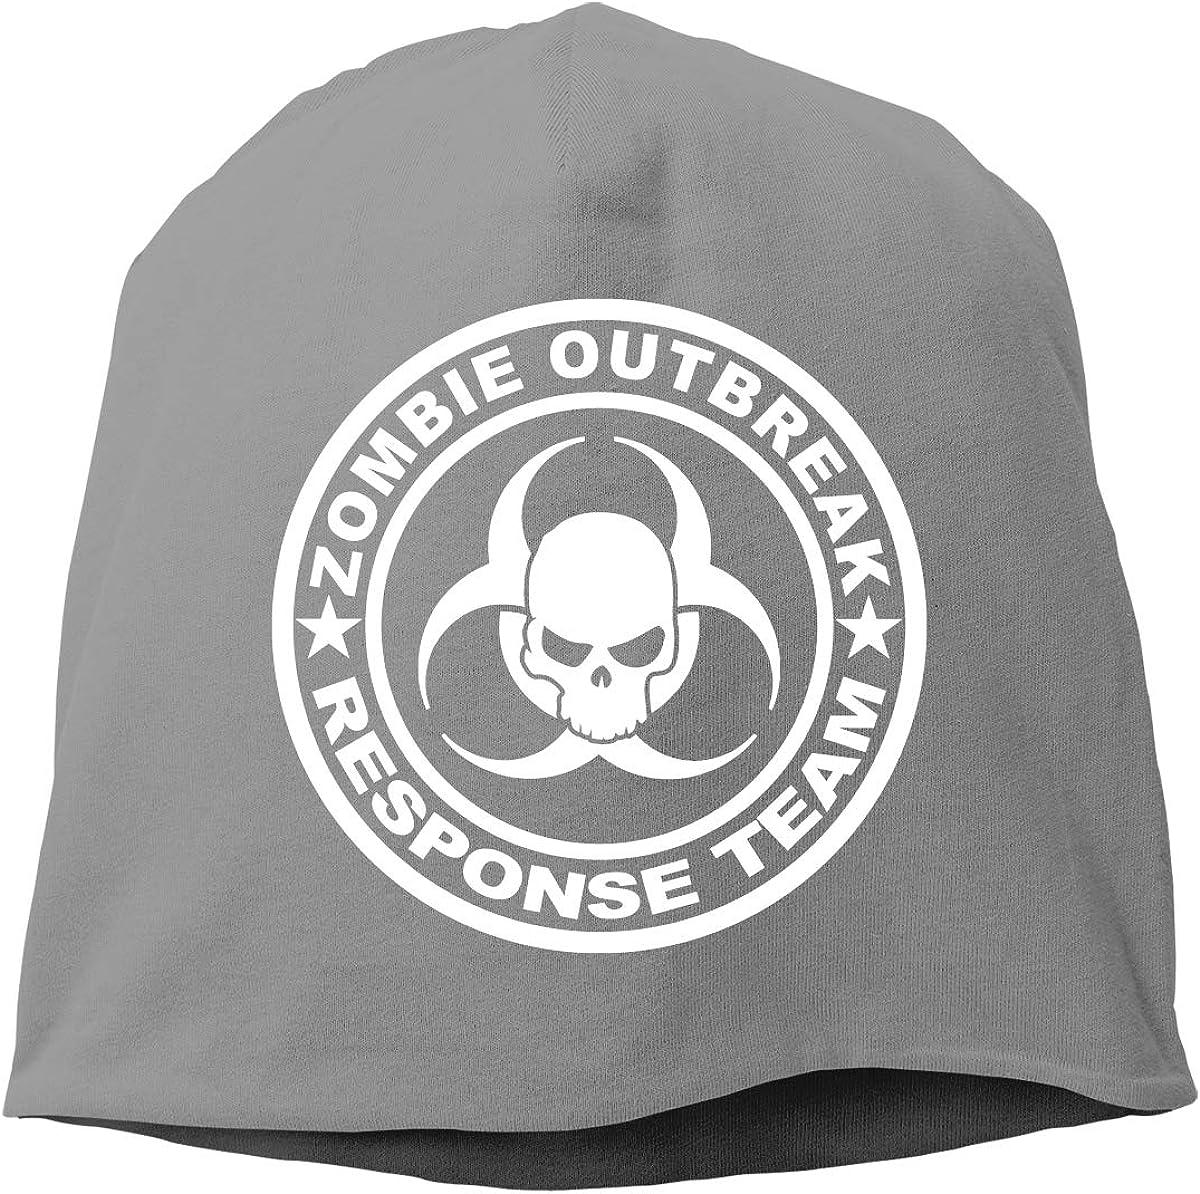 CRISCAP Zombie Outbreak Response Team Helmet Liner Thin Skull Cap Beanie Hip Hop Hat